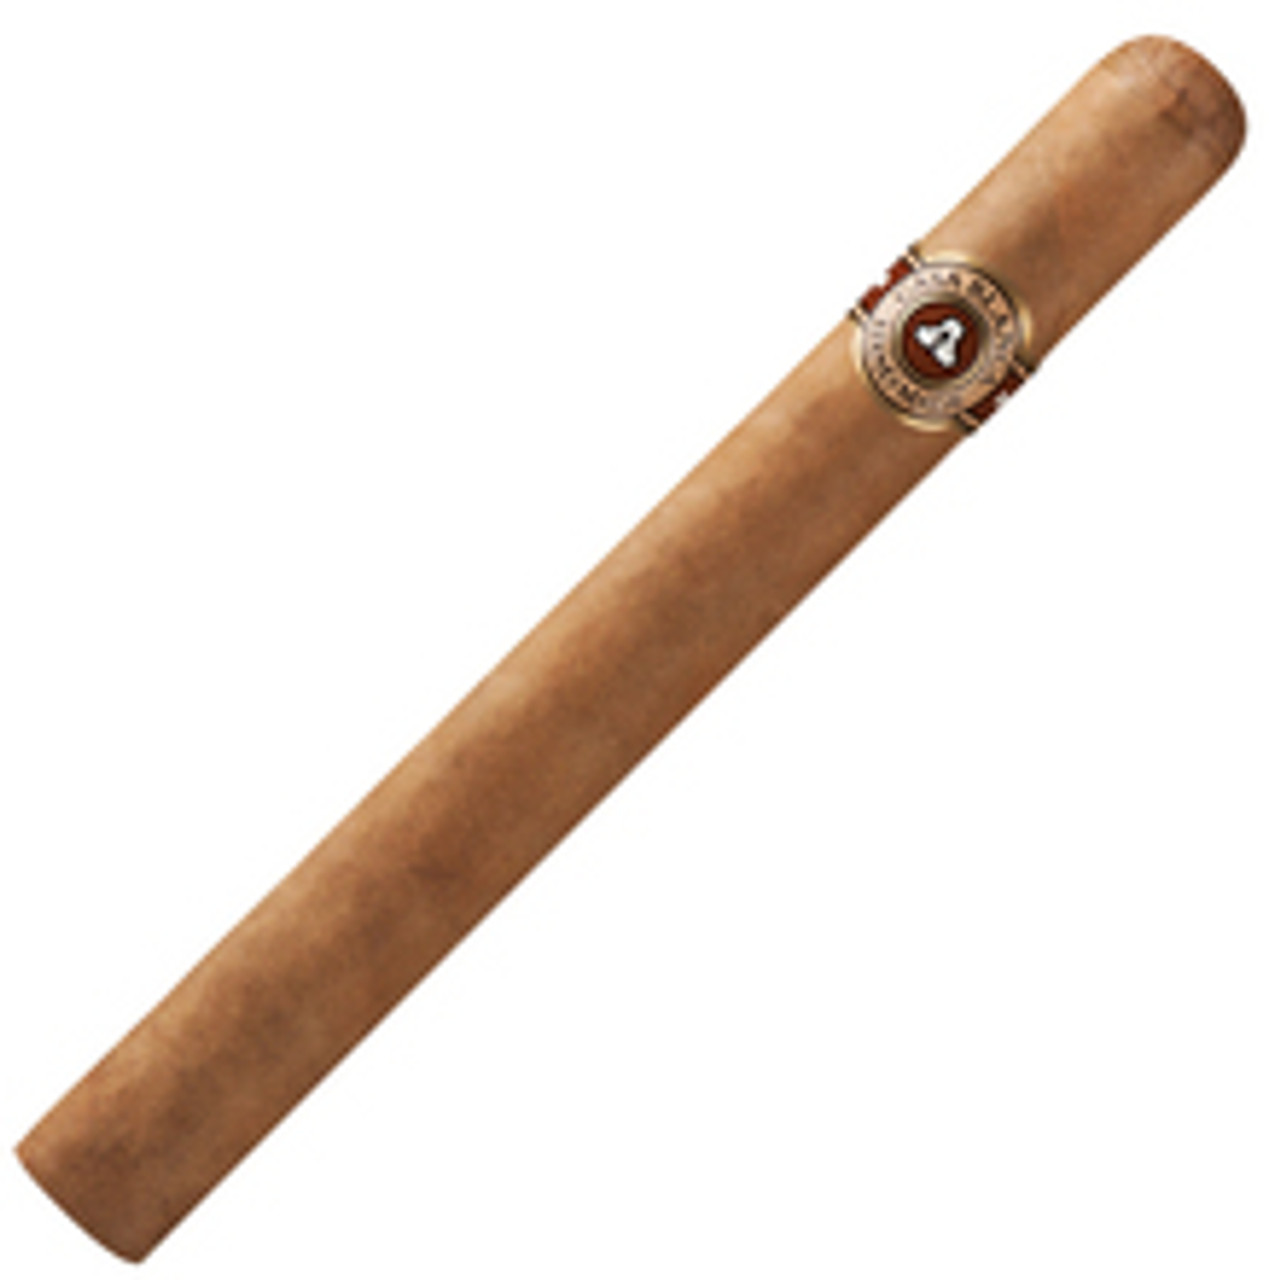 Casa Blanca Jeroboam Cigars - 10 x 66 (Bundle of 10)